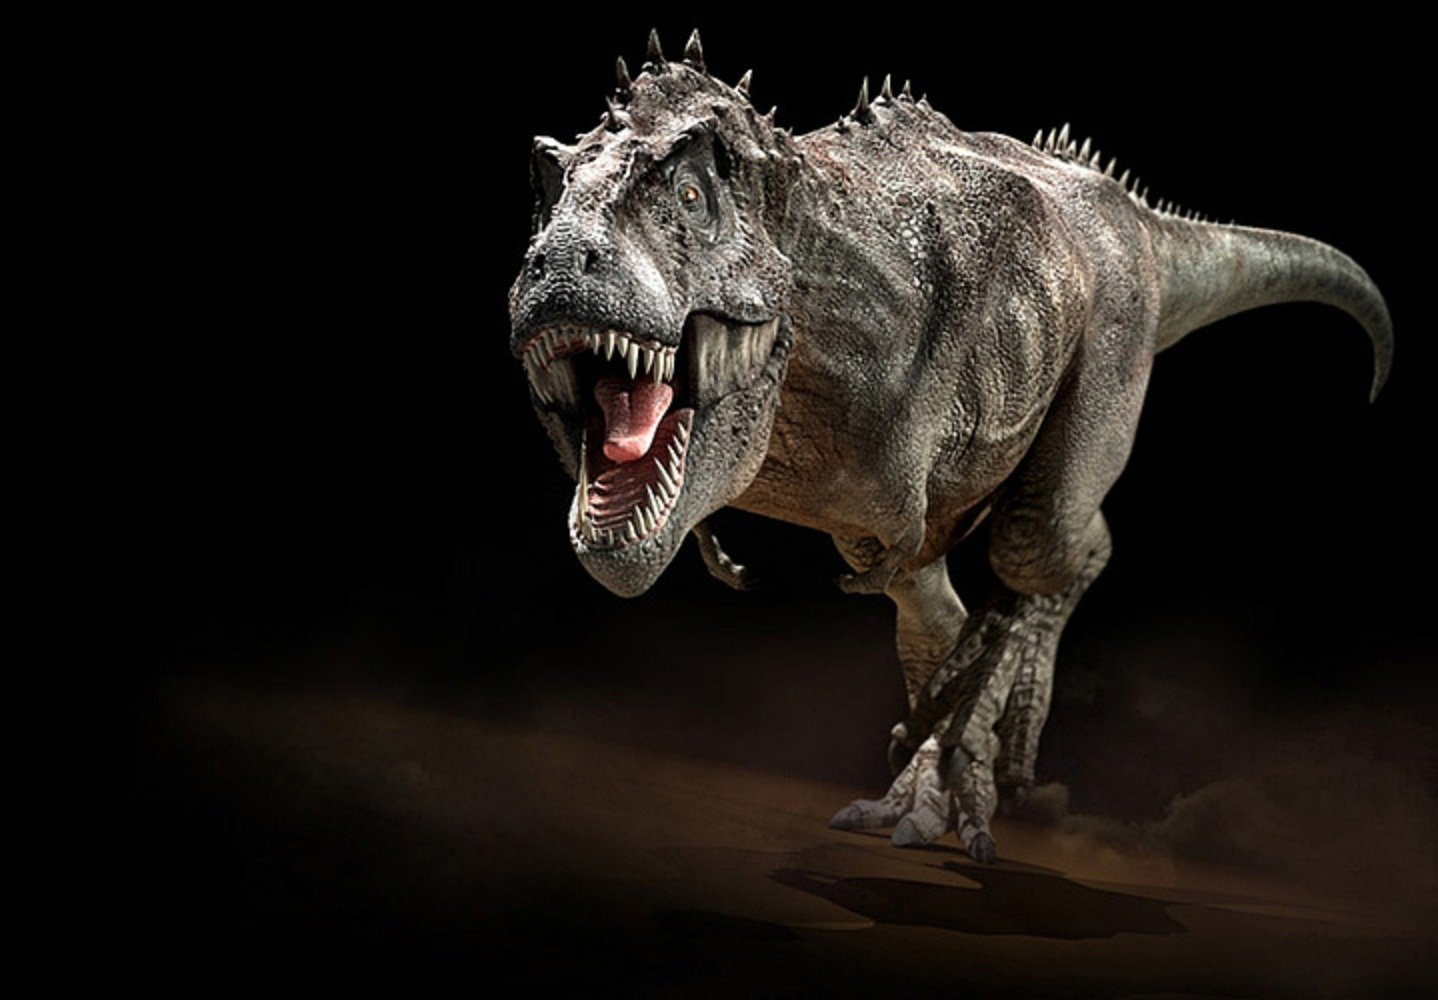 Tyrannosaurus Rex Wallpaper - WallpaperSafari